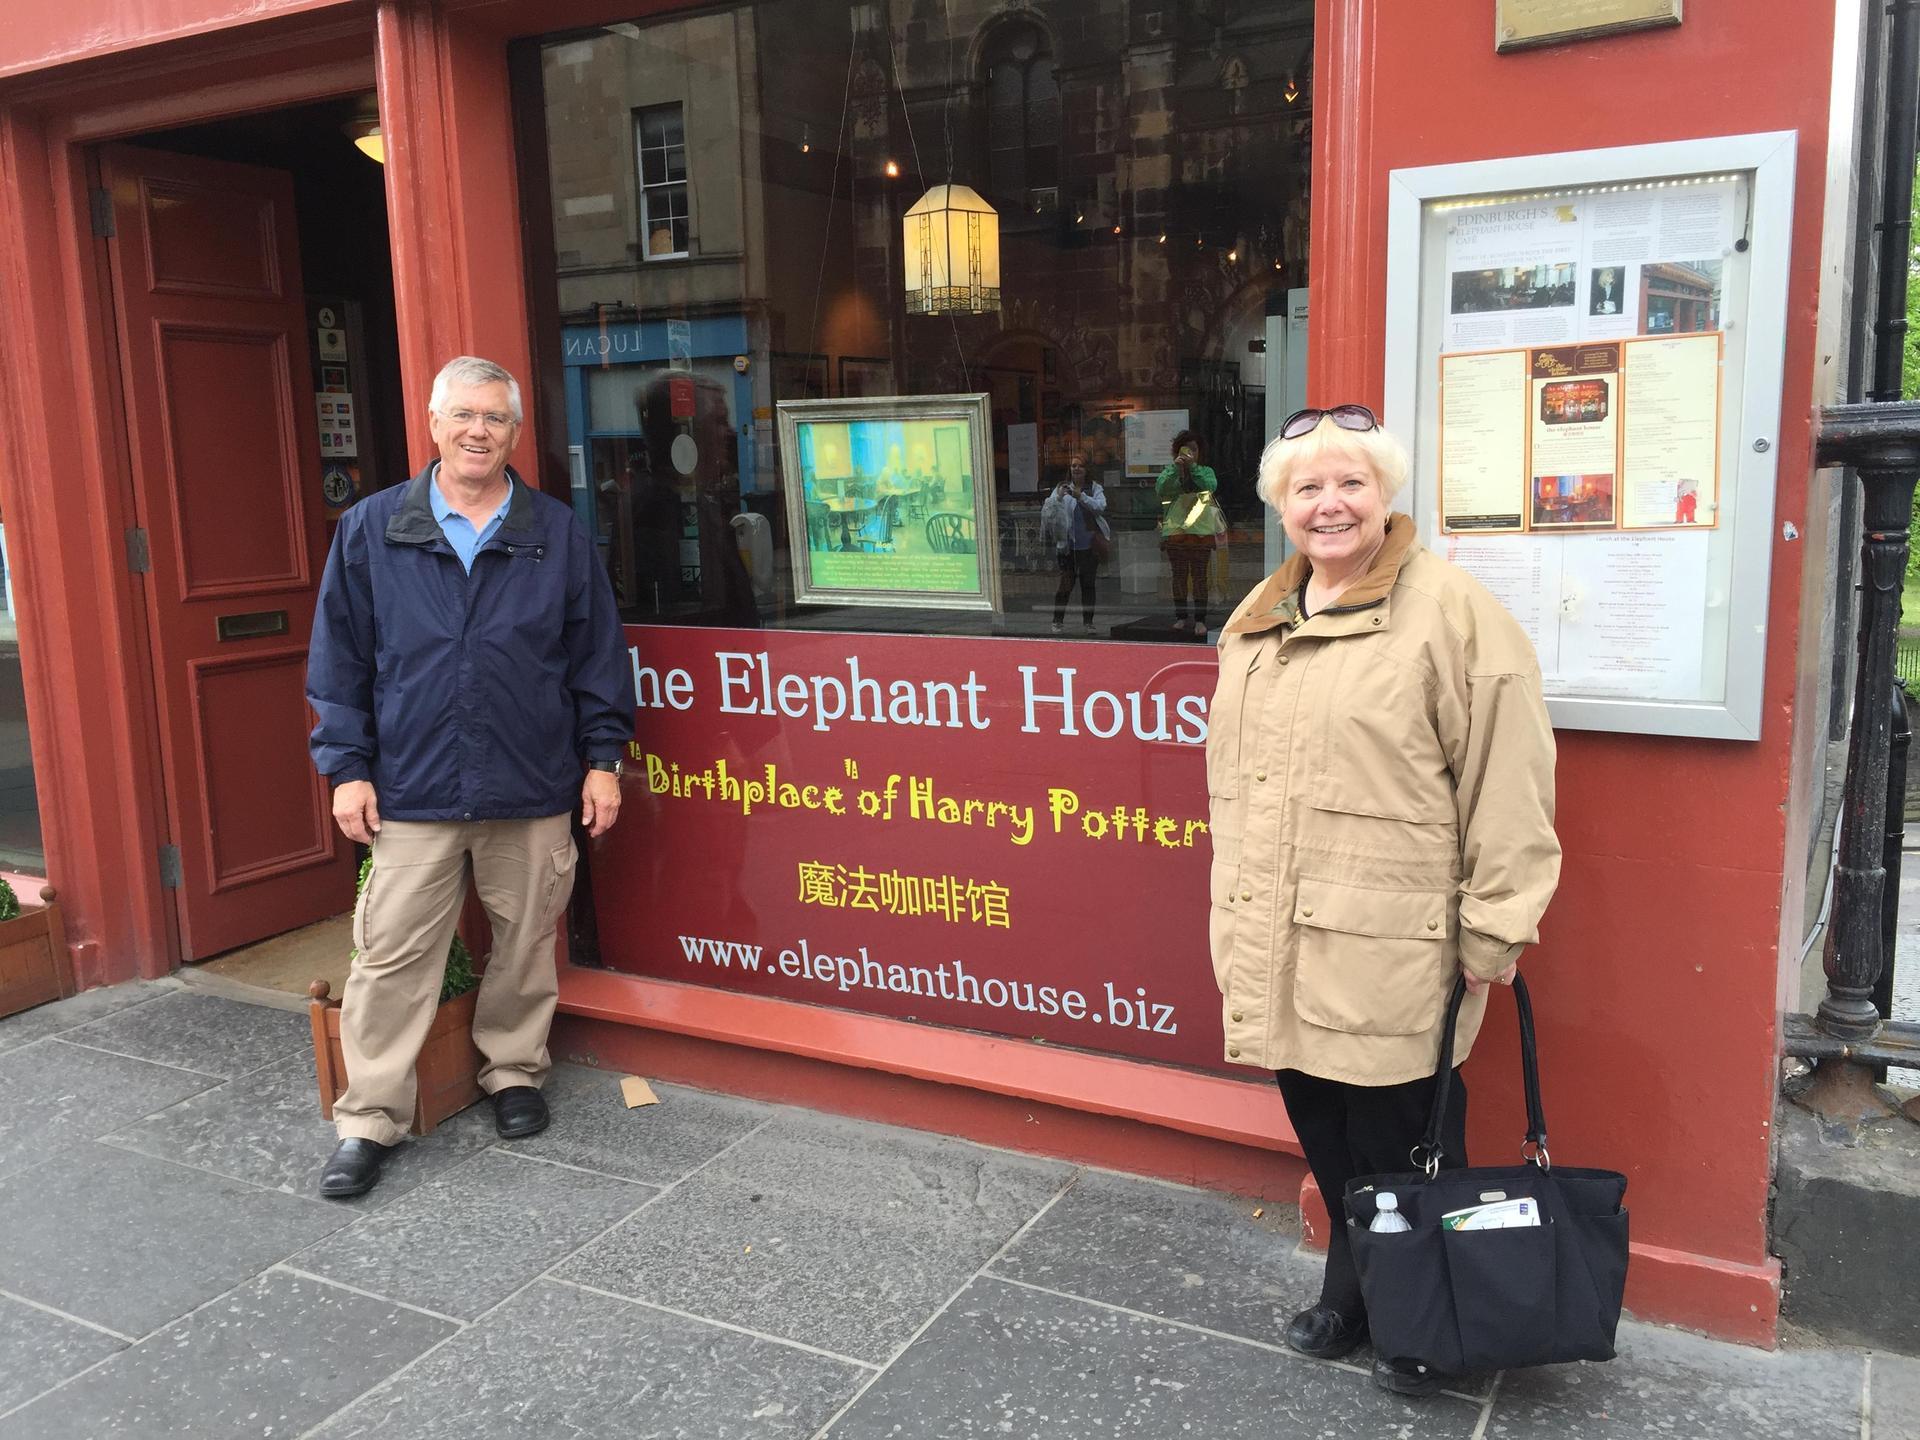 The Elephant House, Edinburgh, Scotland